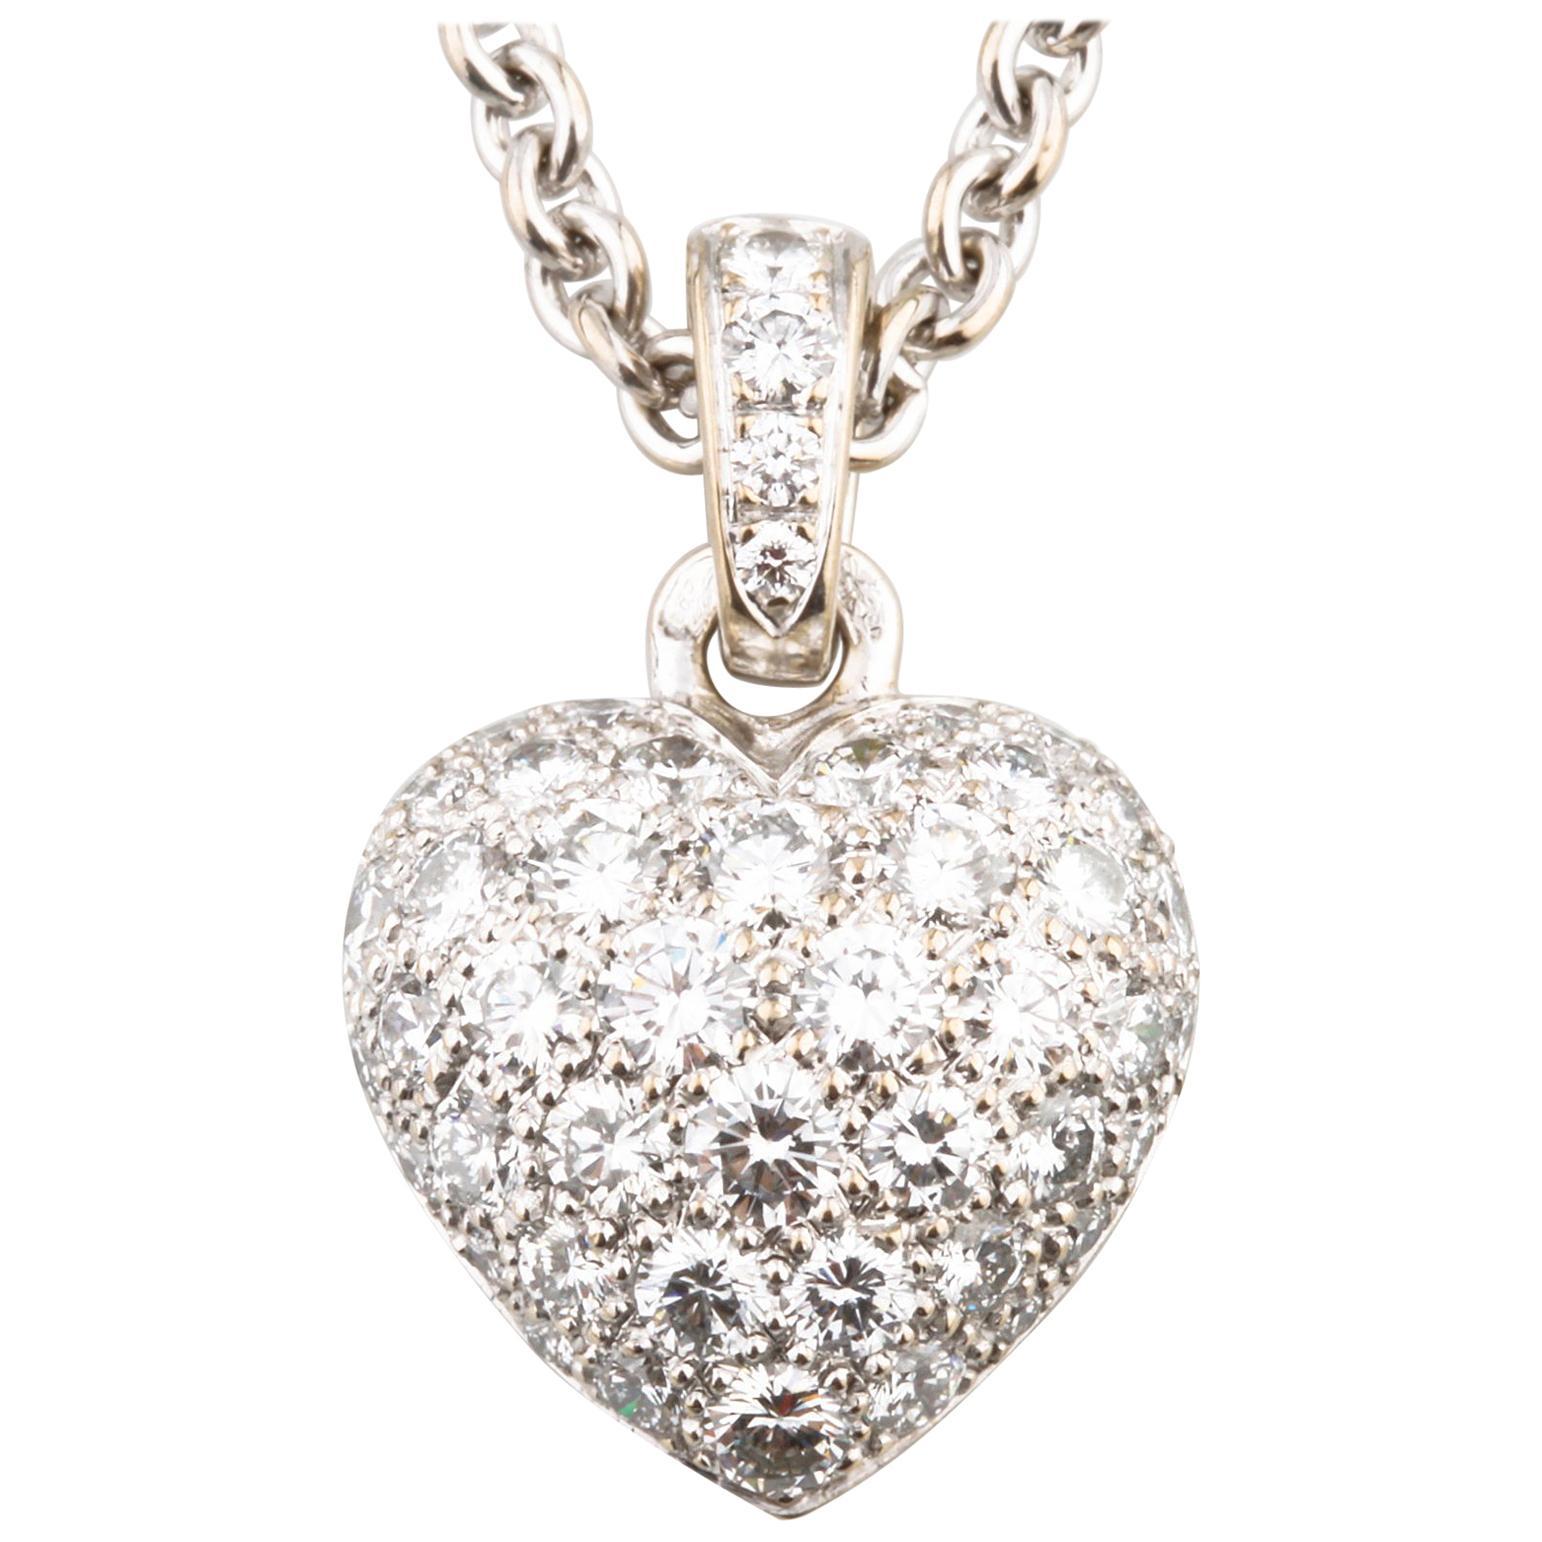 Cartier Pave Diamond 18 Karat White Gold Heart Pendant Necklace